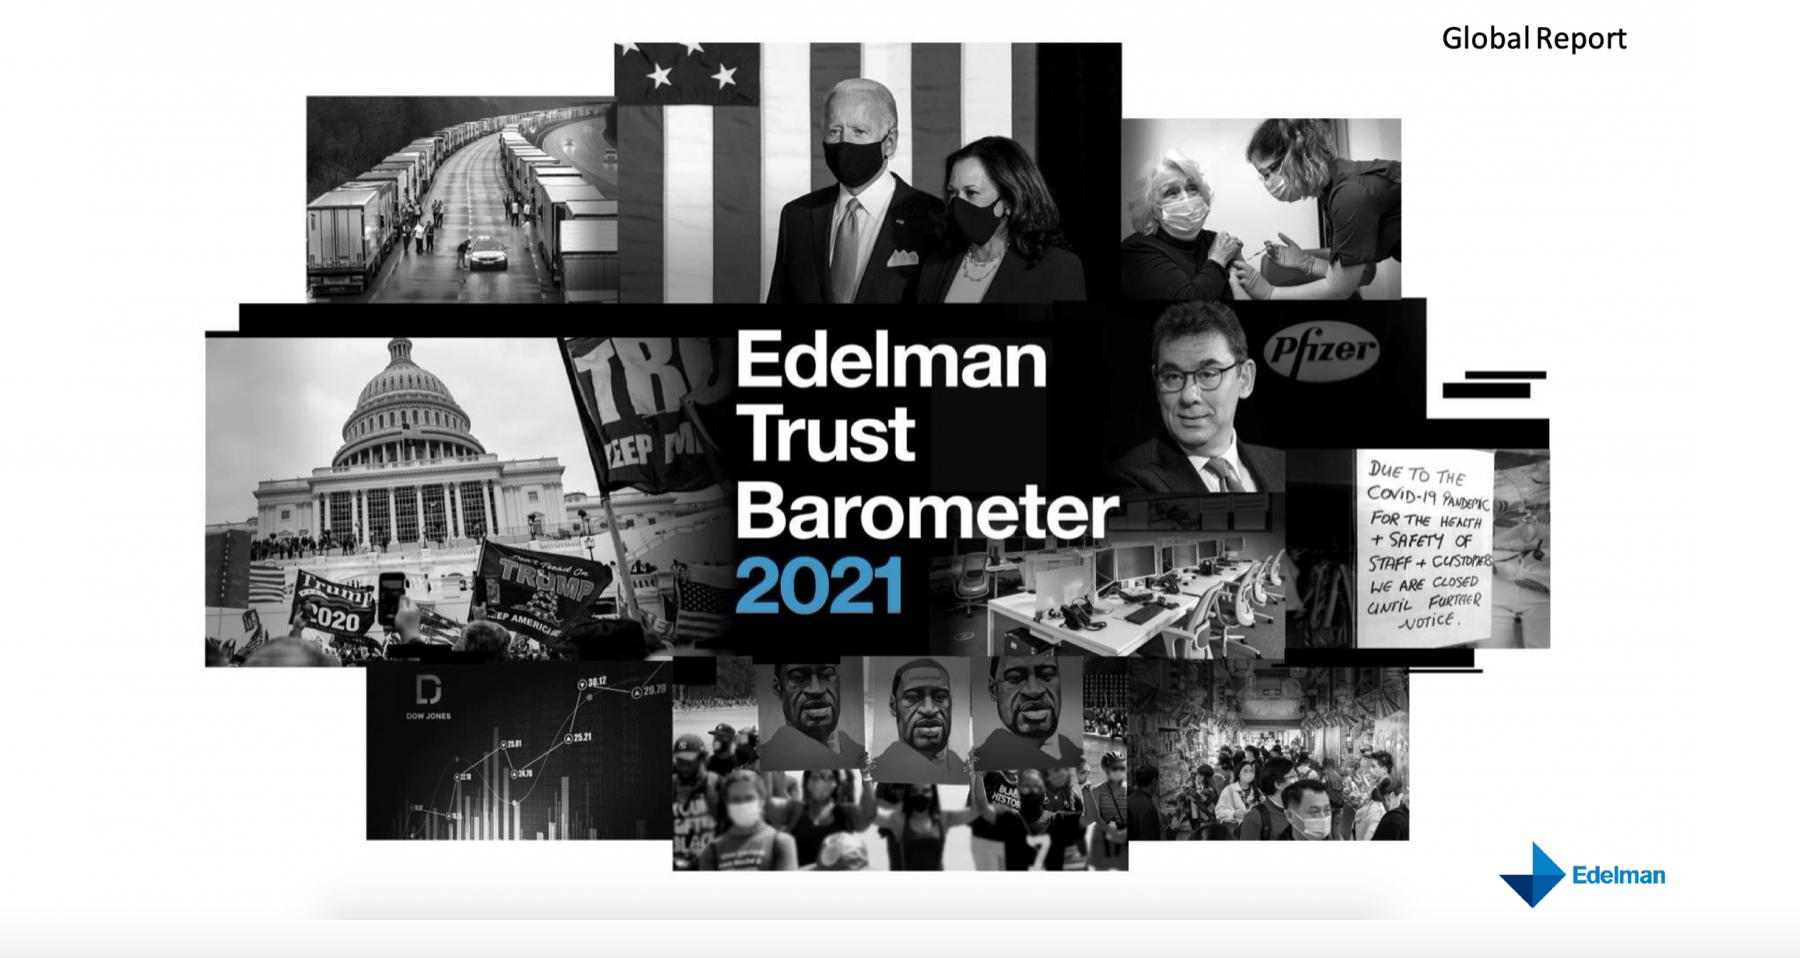 Edelman Trust release their 2020 Barometer report